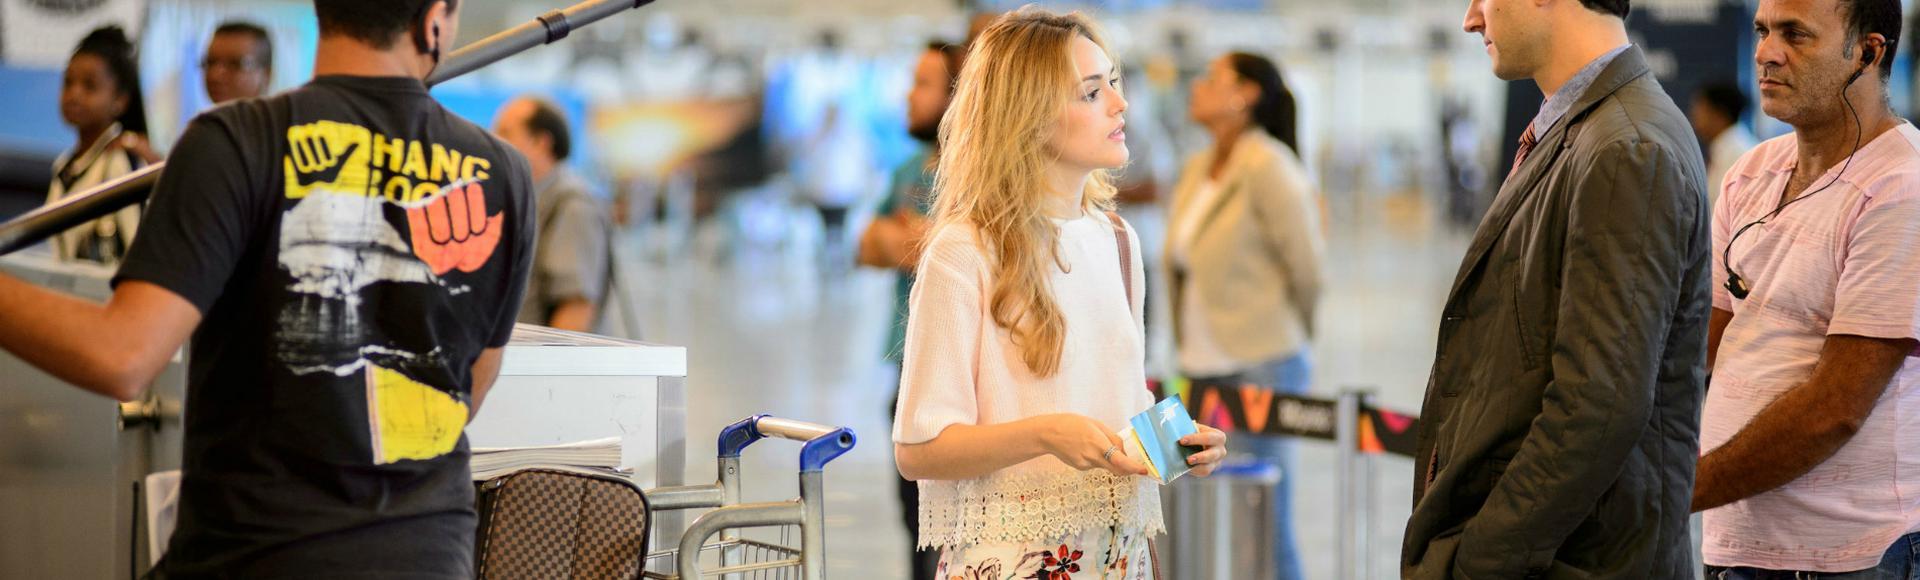 Cena da novela 'Sete Vidas', da Rede Globo